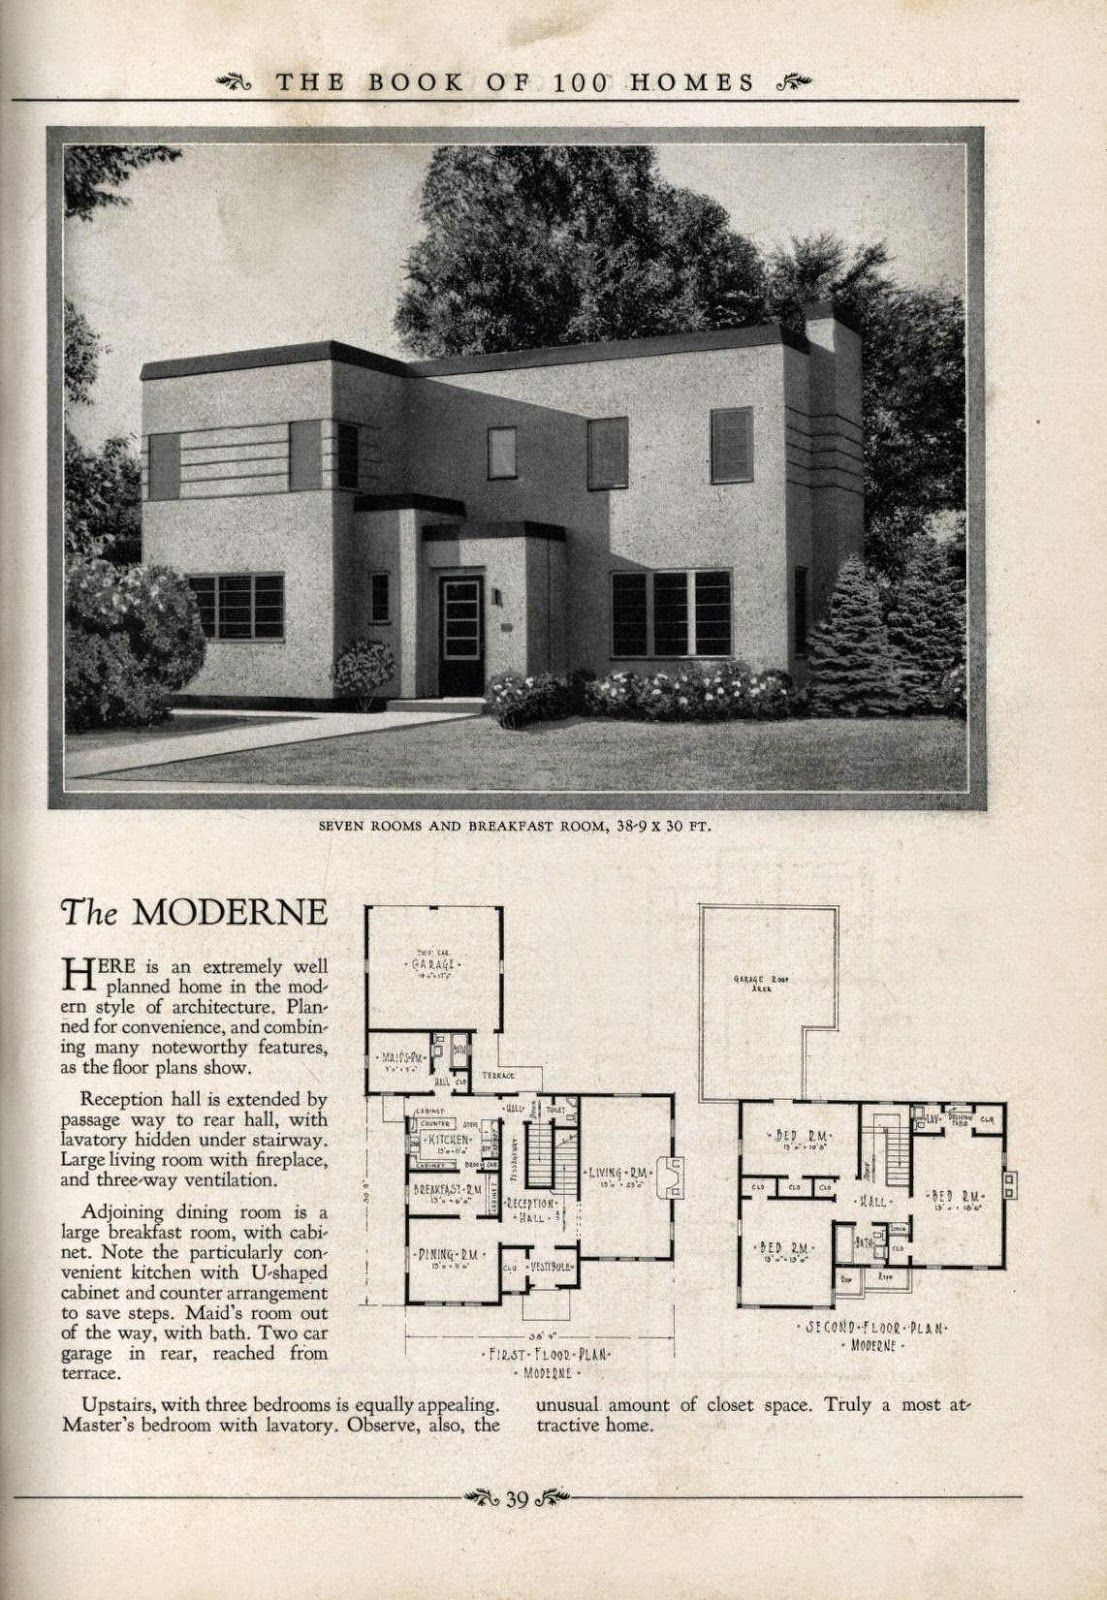 Art Deco Ranch House In 2020 Art Deco Home Modern Art Deco Art Deco